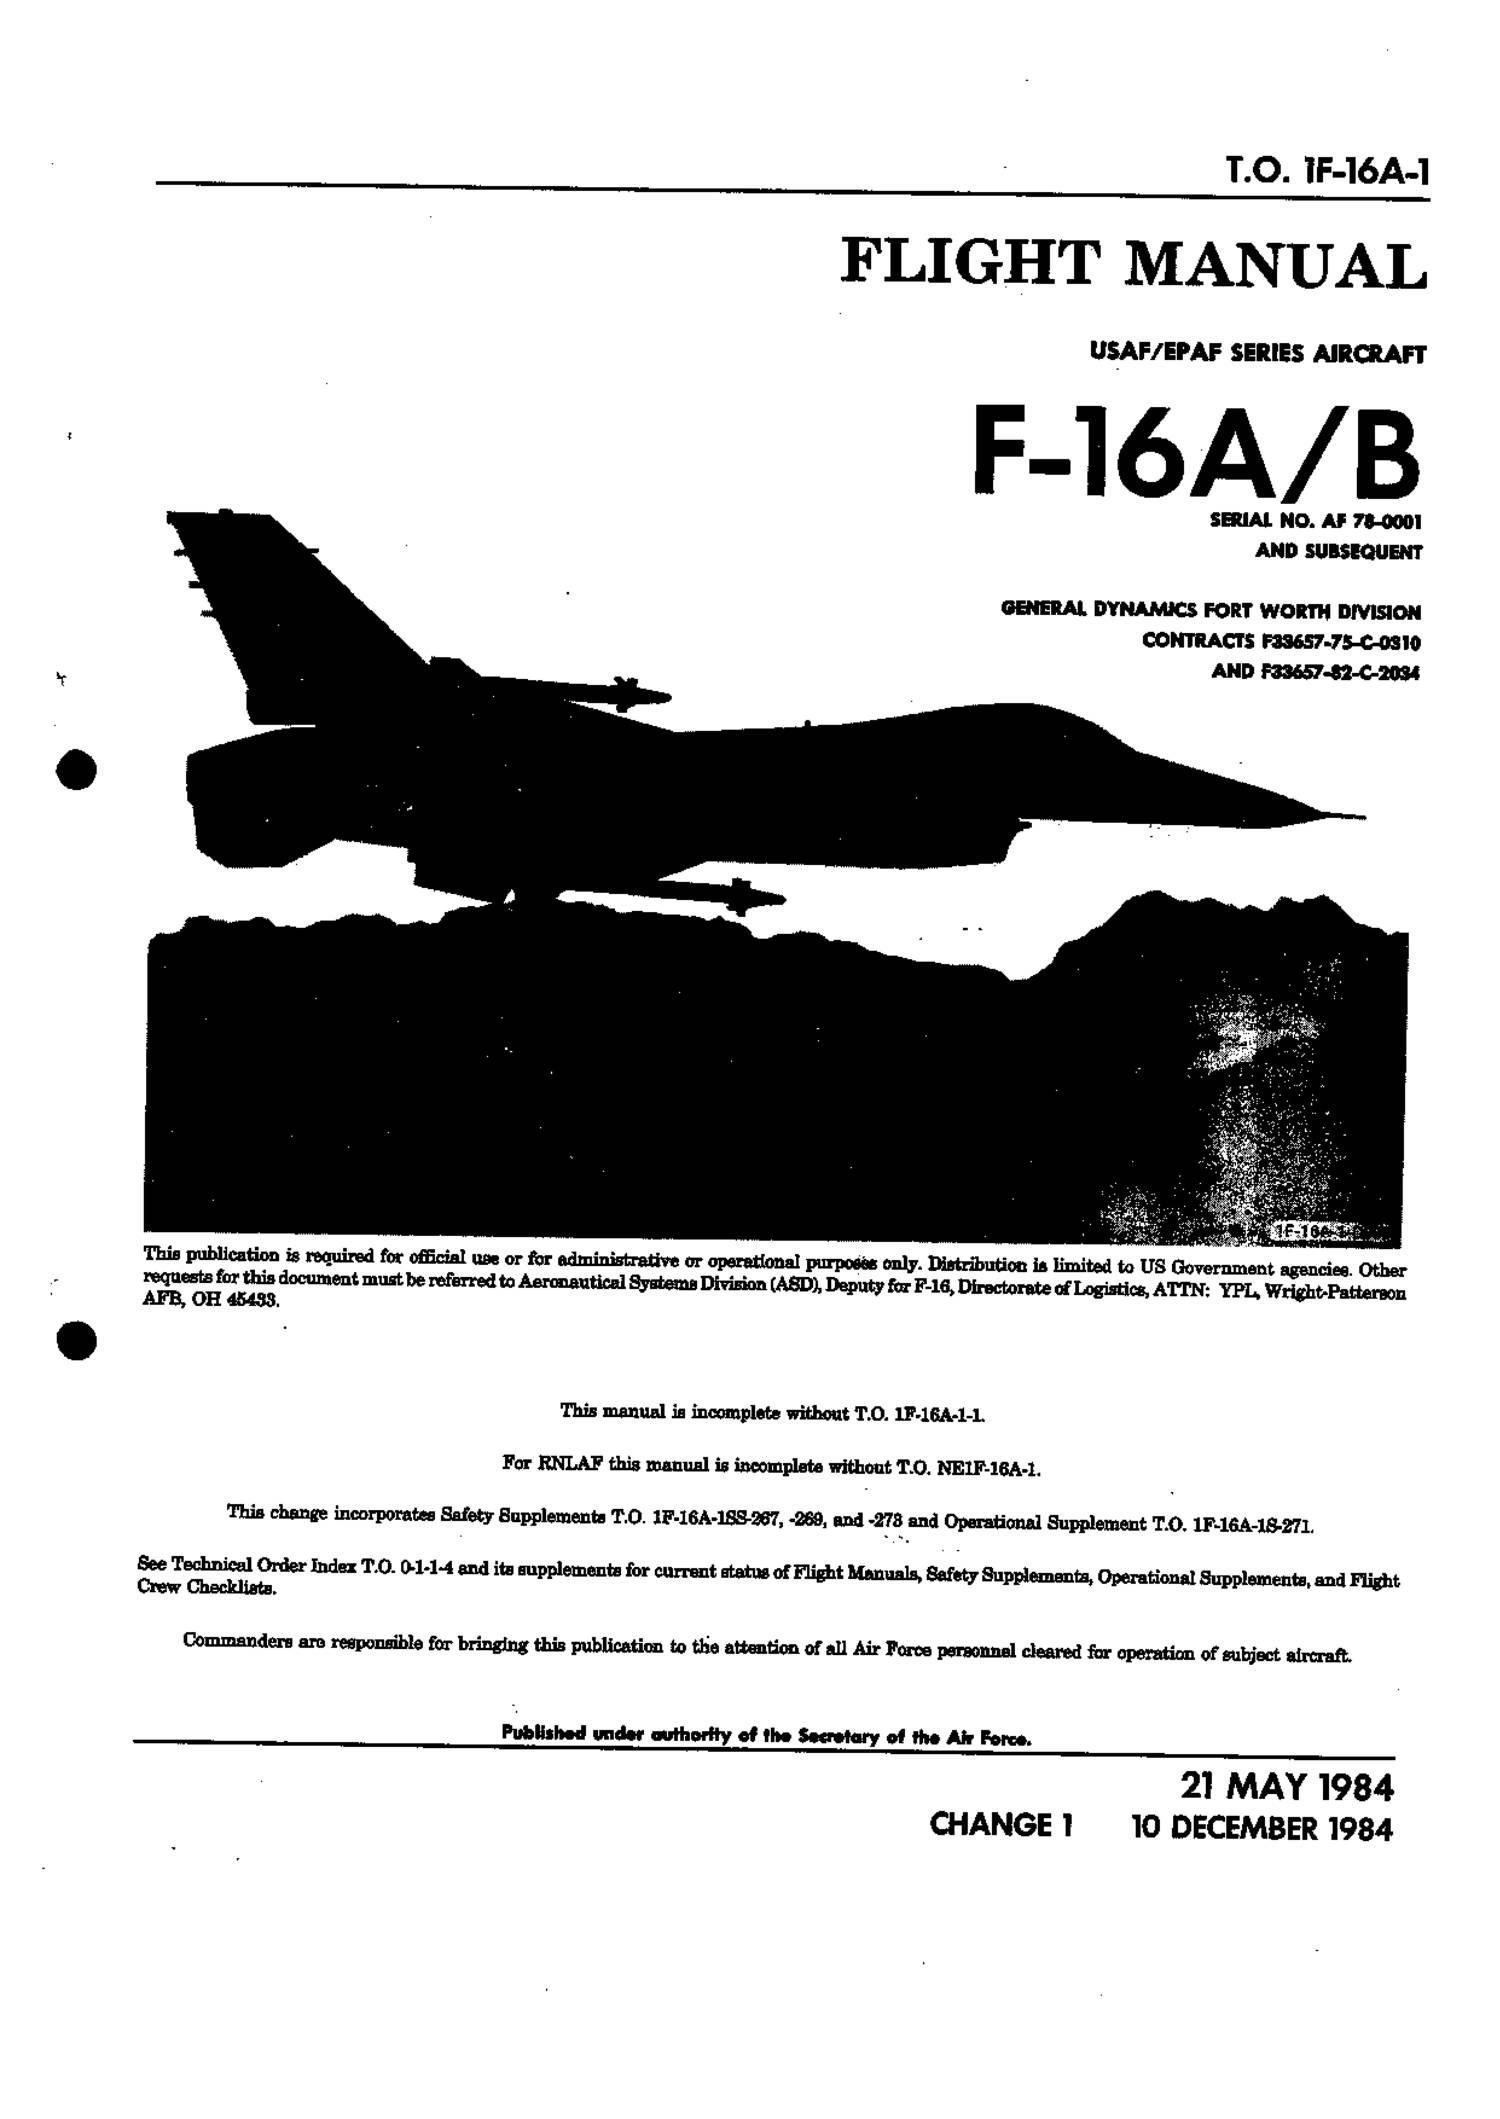 F-16AB Fighting Falcon Flight Manual (USAF).pdf | DocDroid